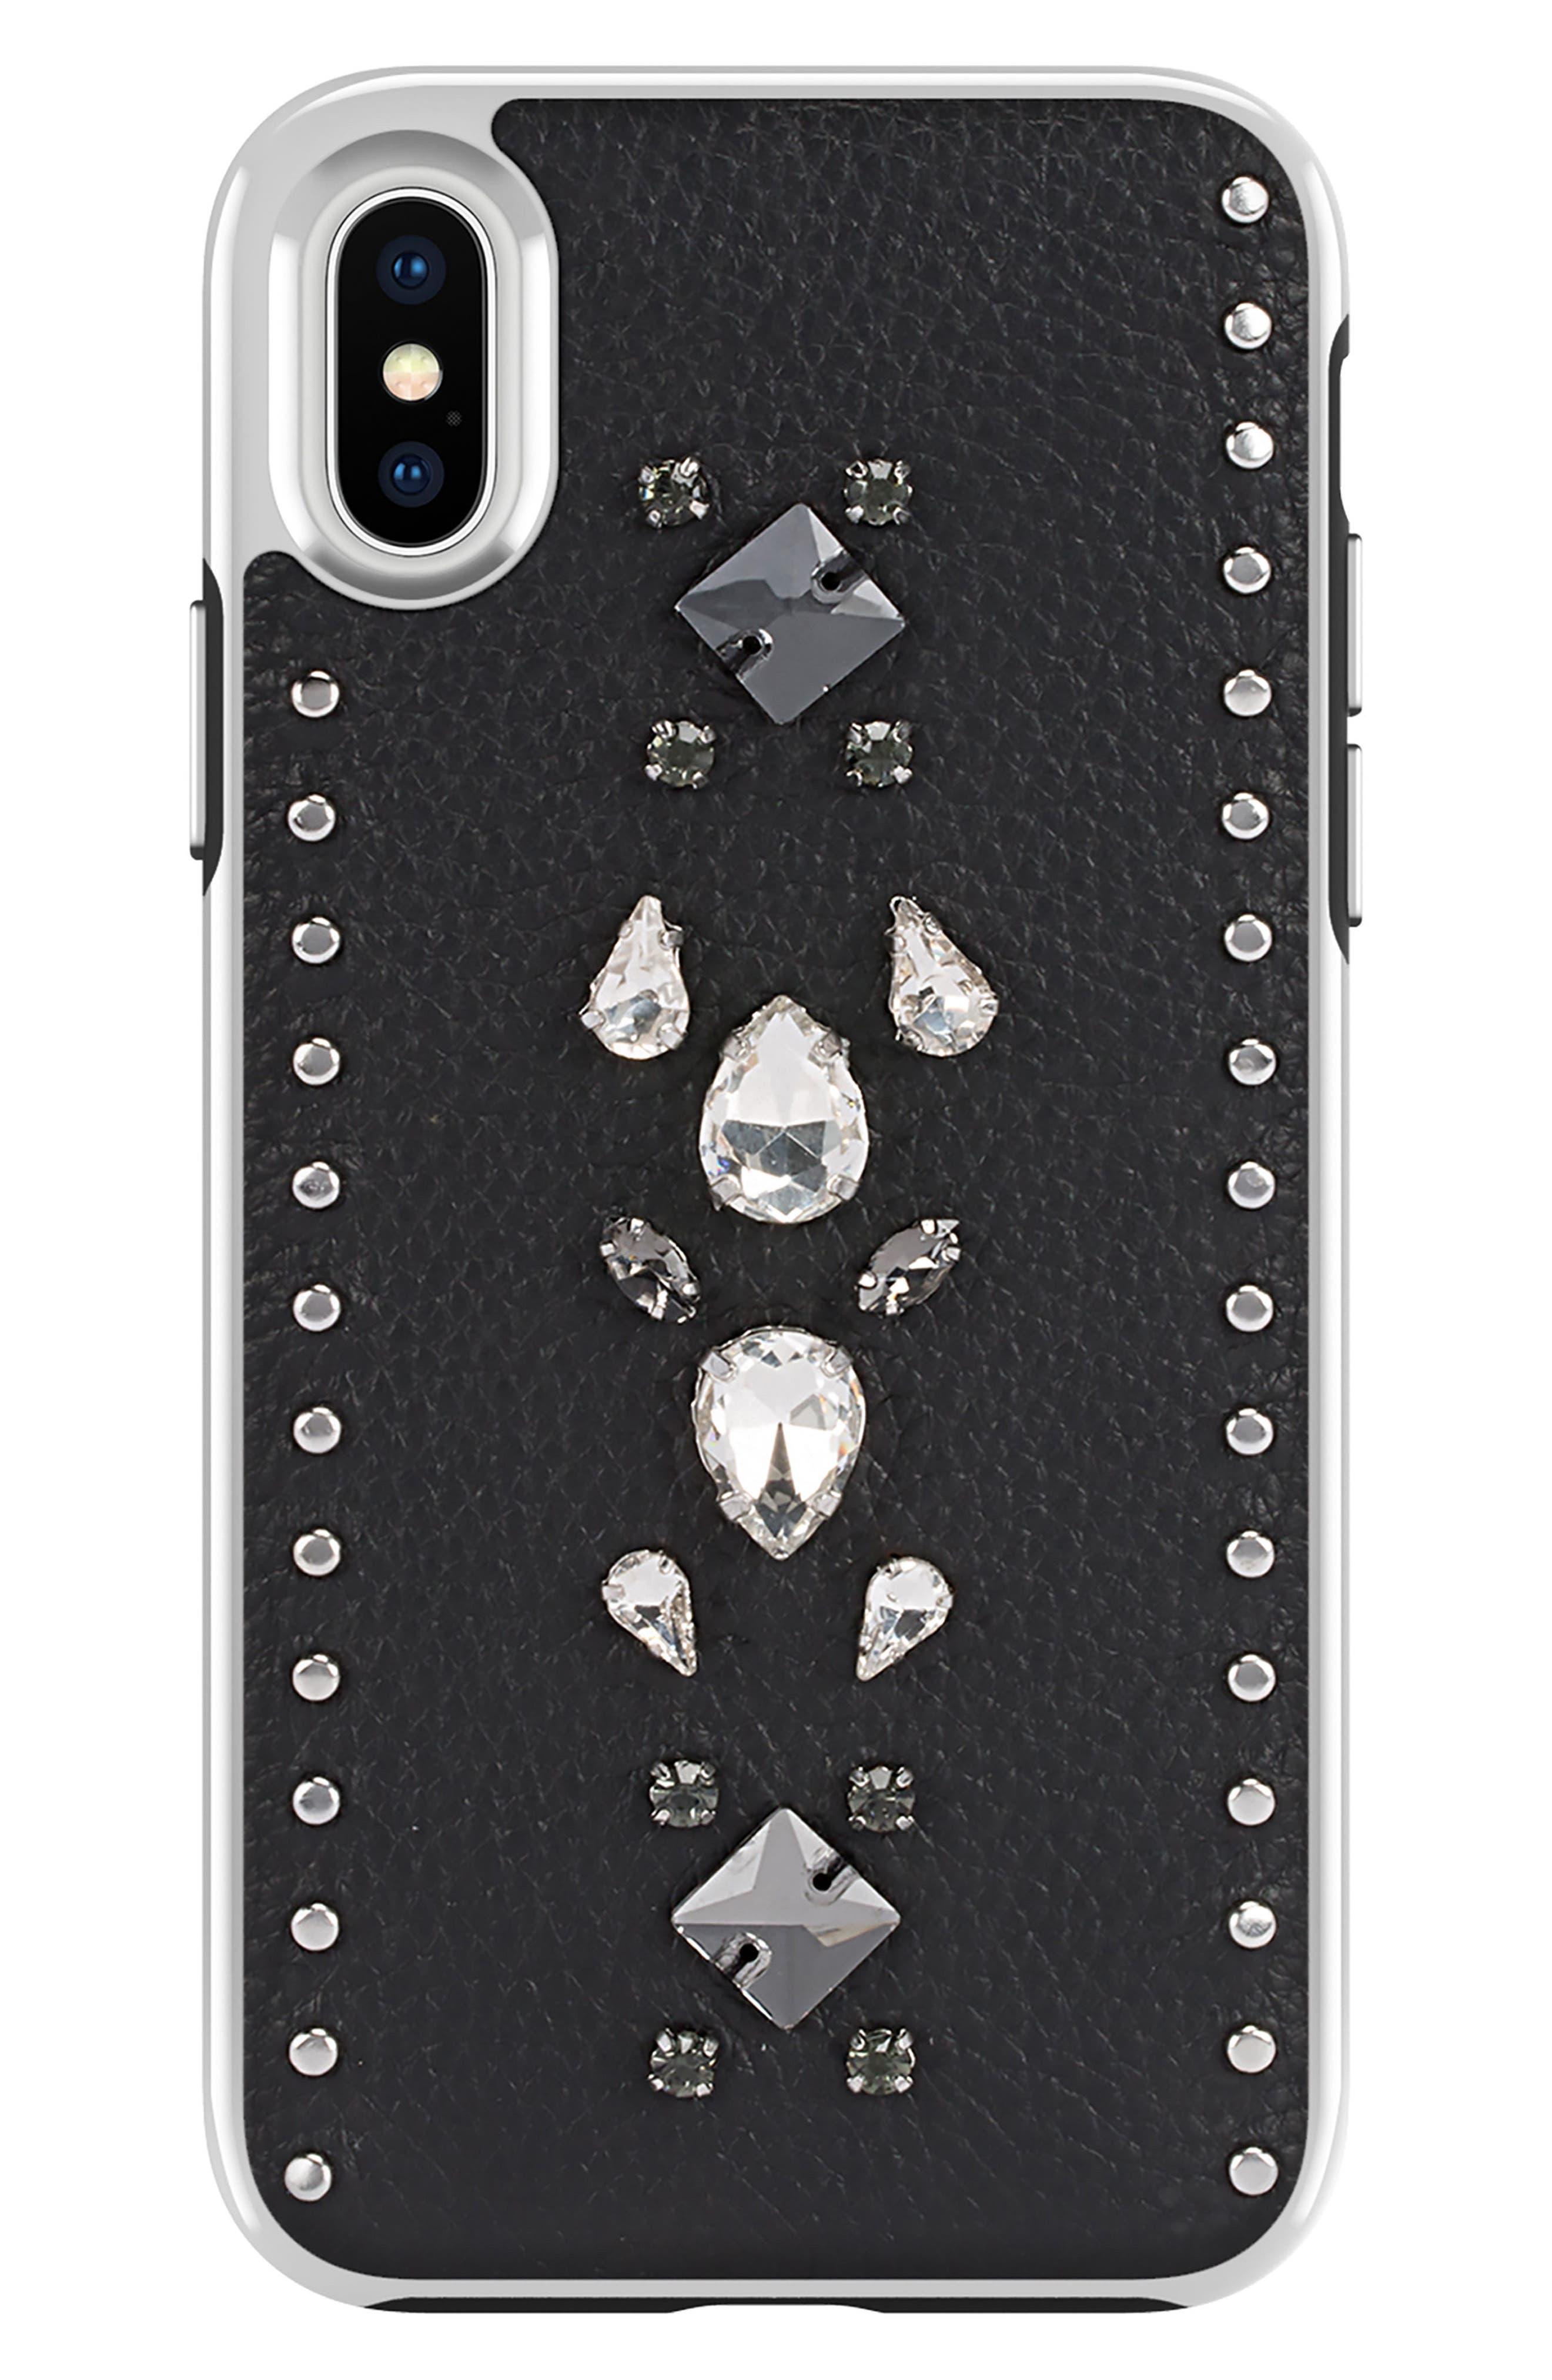 Inlay Jem Leather iPhone X Case,                         Main,                         color, Multi Gems/ Studs/ Black